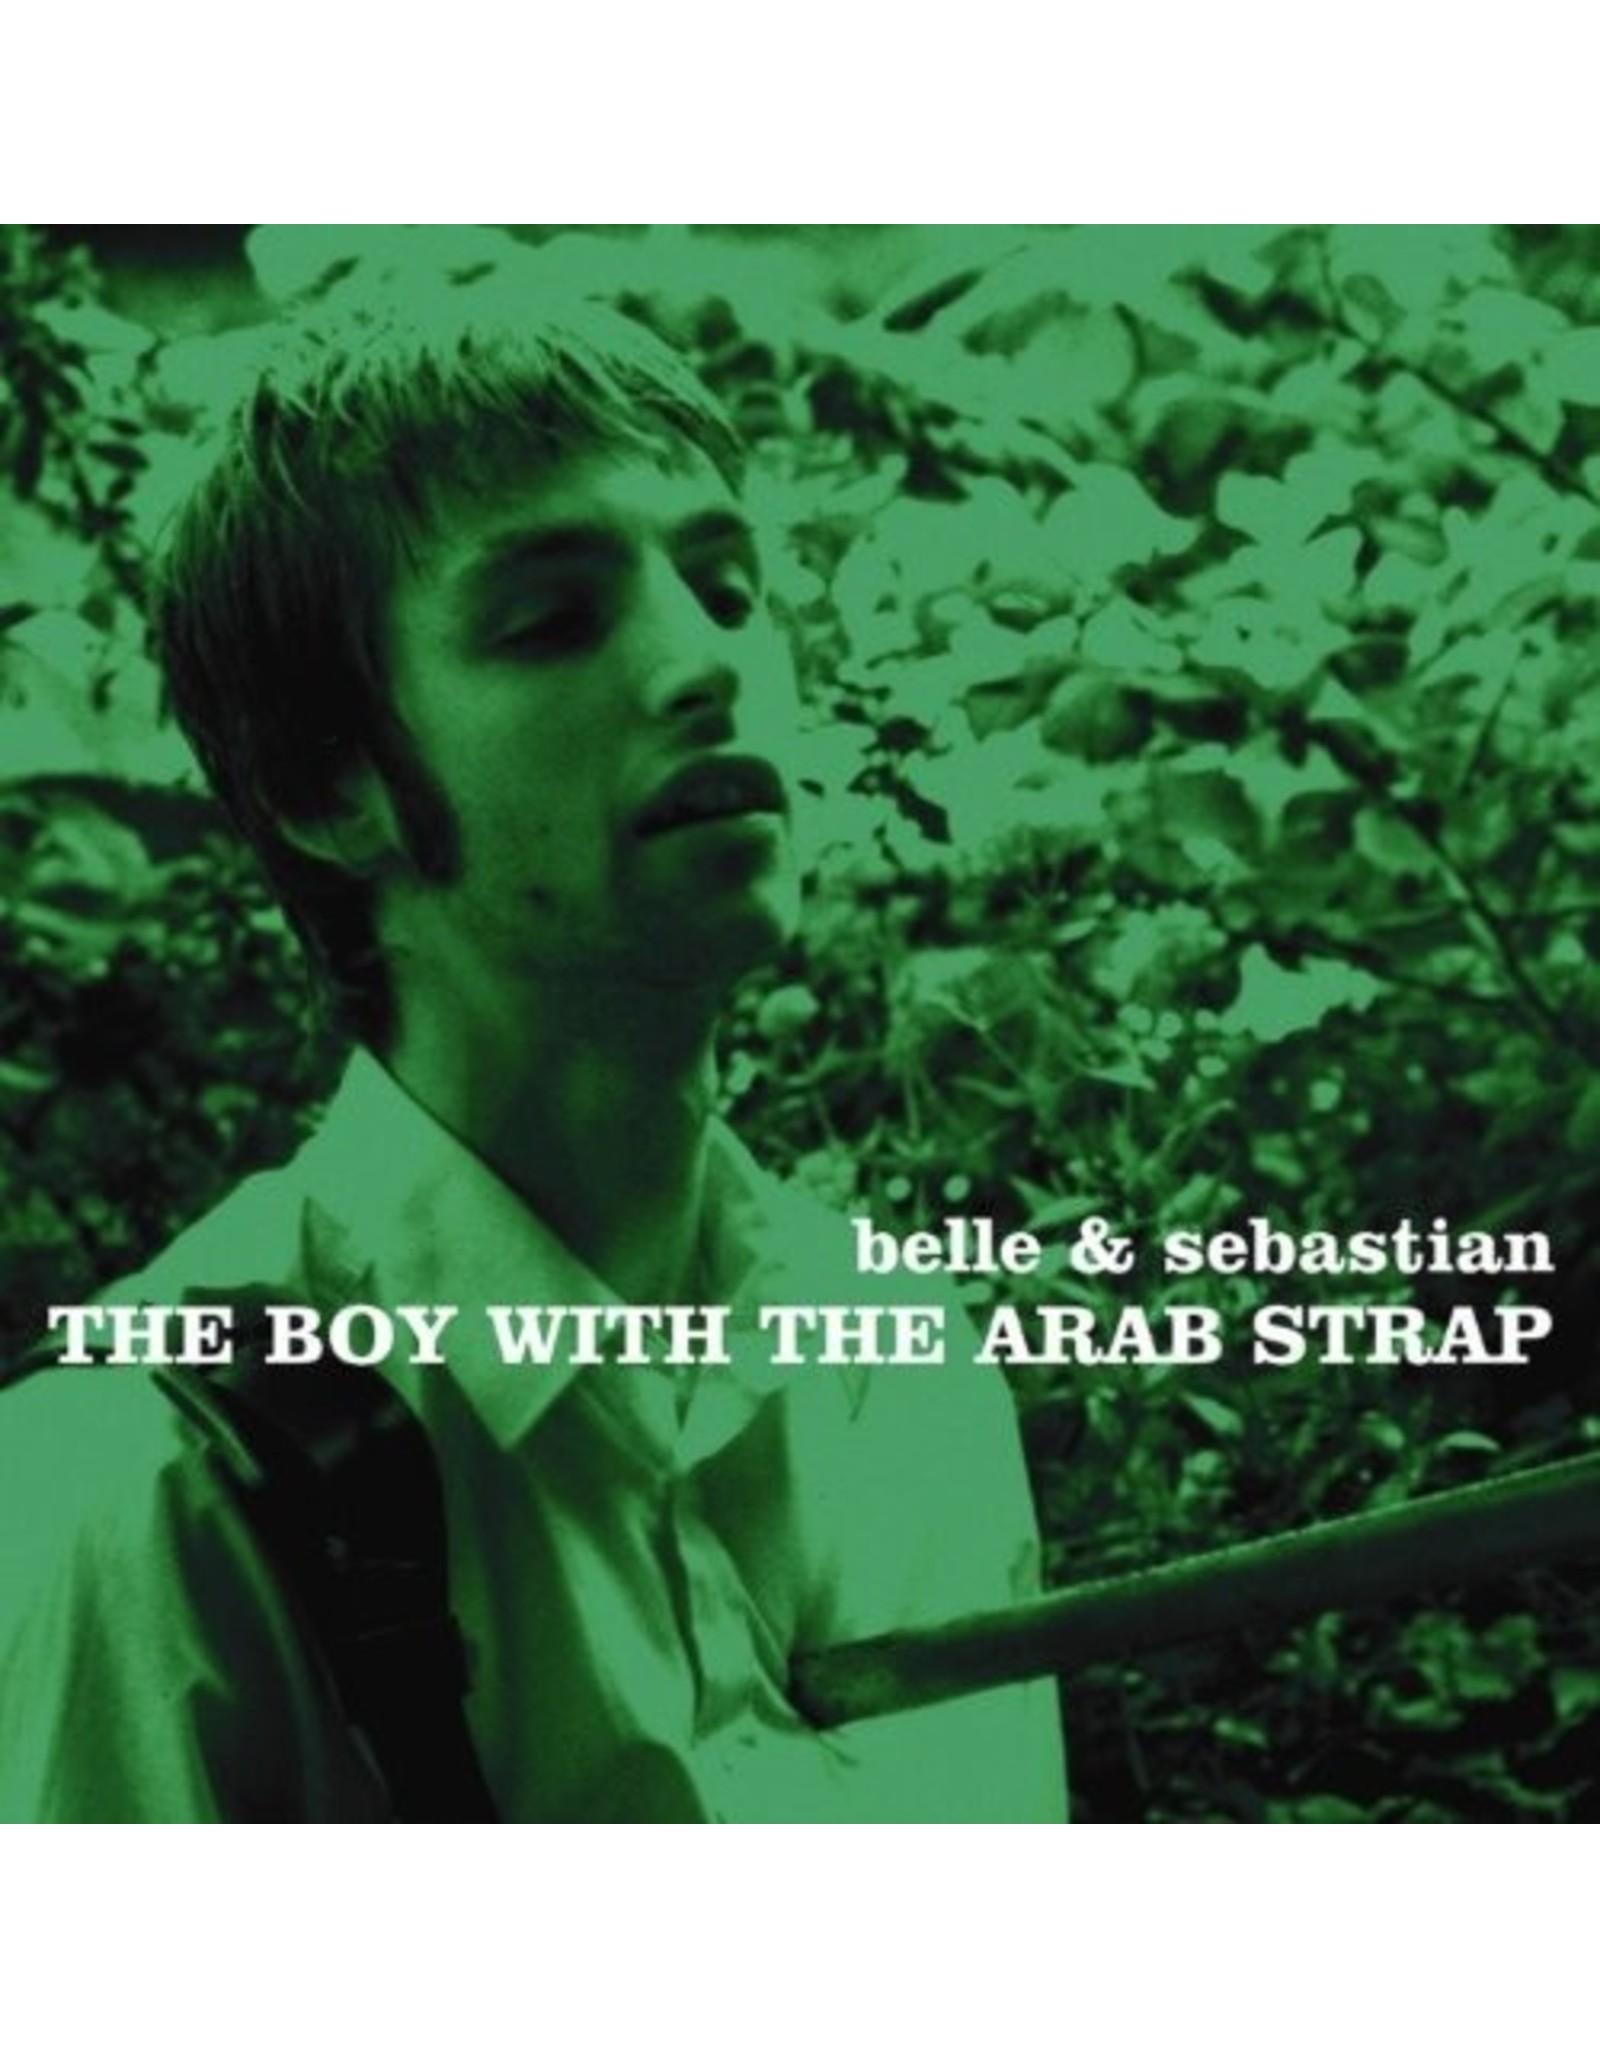 New Vinyl Belle & Sebastian - The Boy With The Arab Strap LP